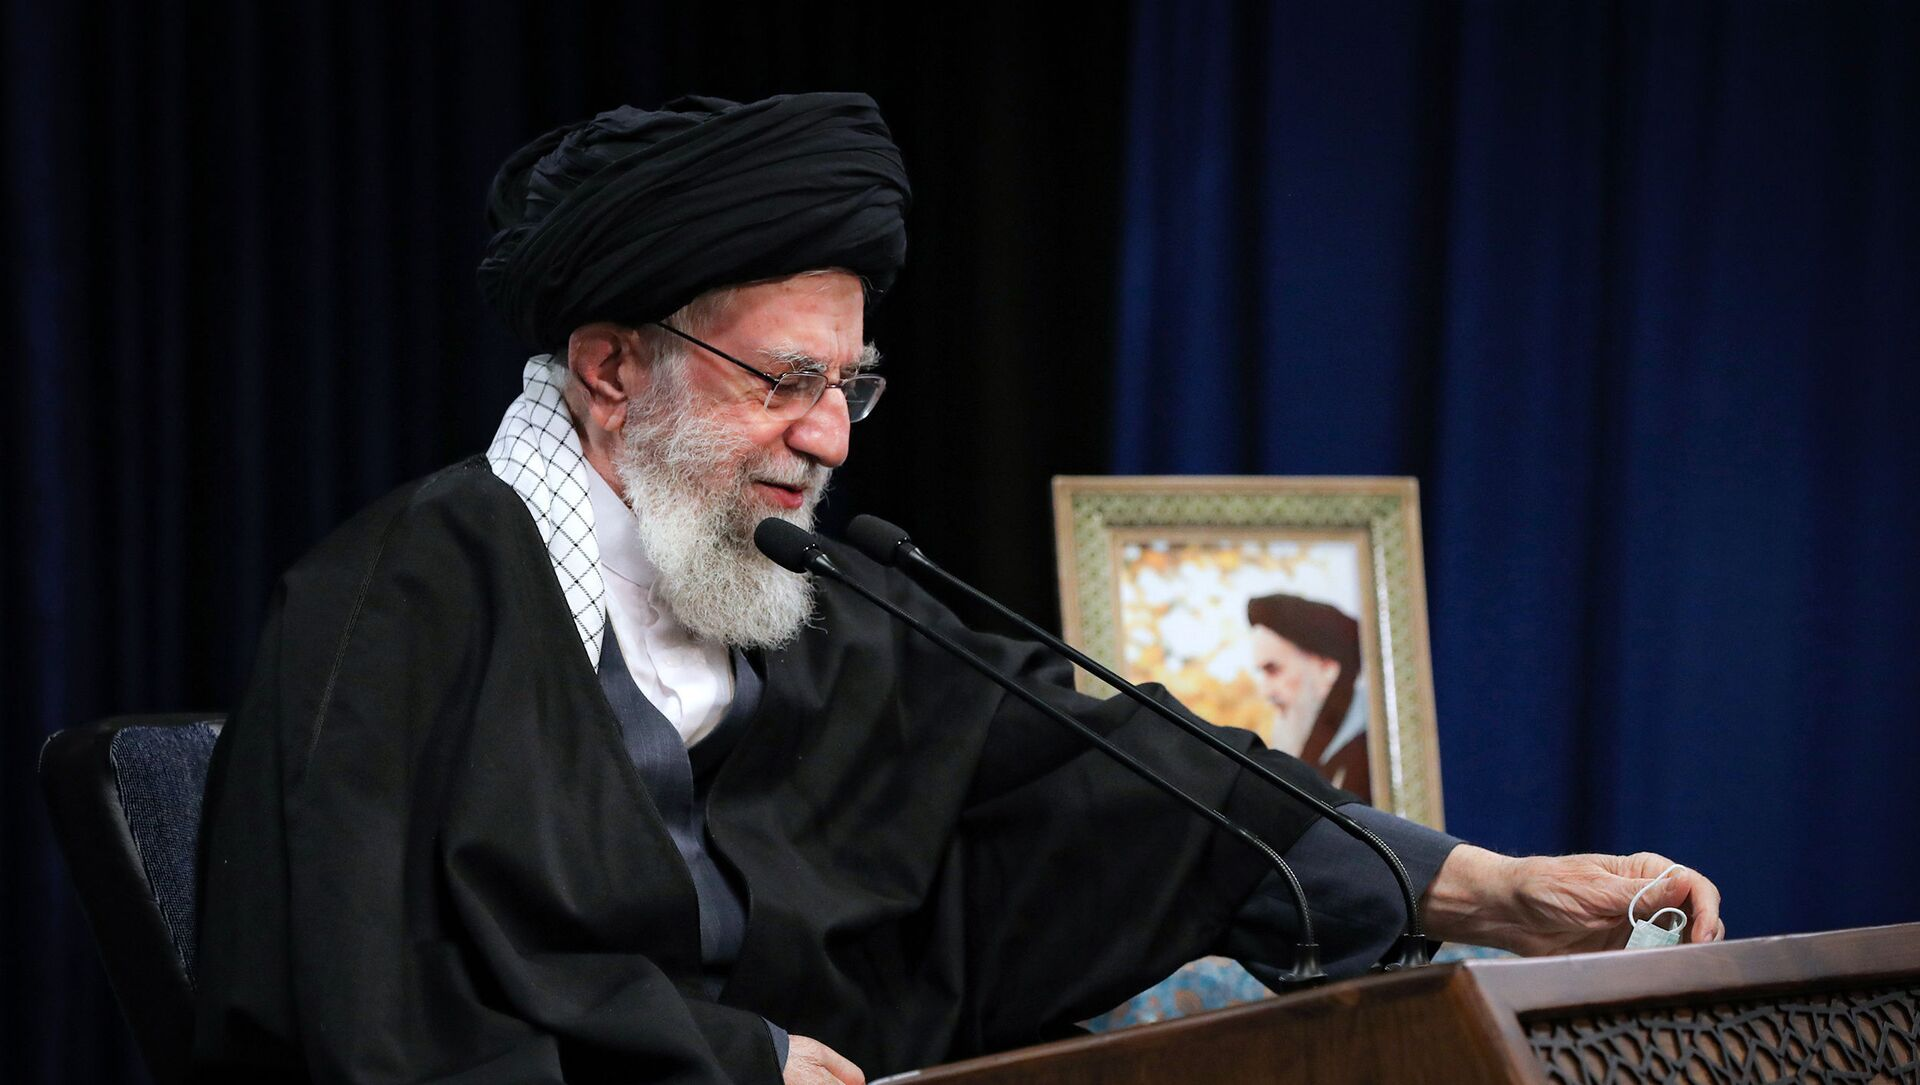 Верховный лидер Ирана аятолла Али Хаменеи, фото из архива - Sputnik Азербайджан, 1920, 07.02.2021